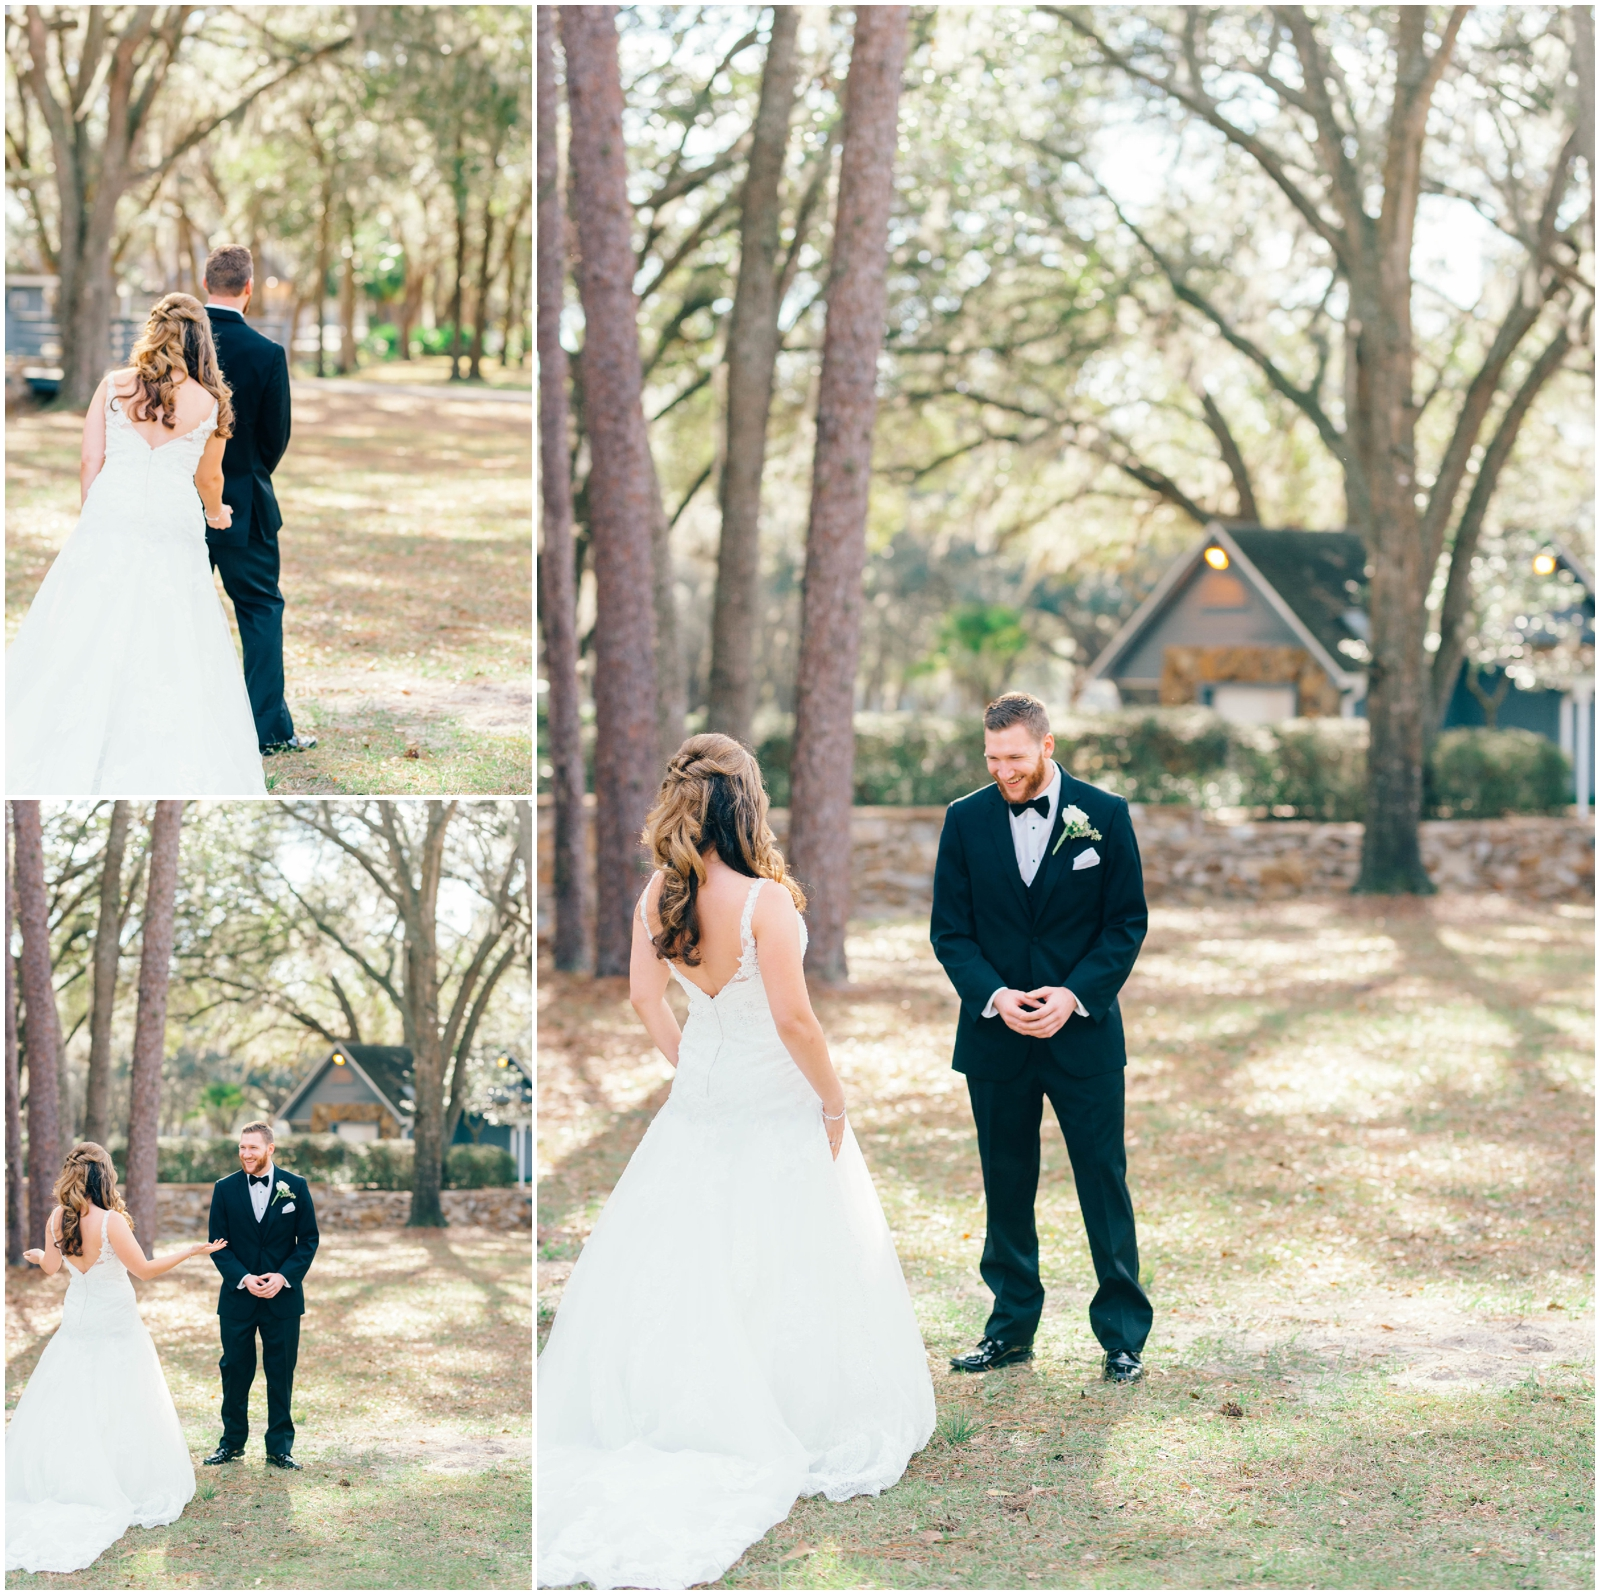 Tampa Area Wedding Venue with Southern Charm- Stonebridge Events_0270.jpg